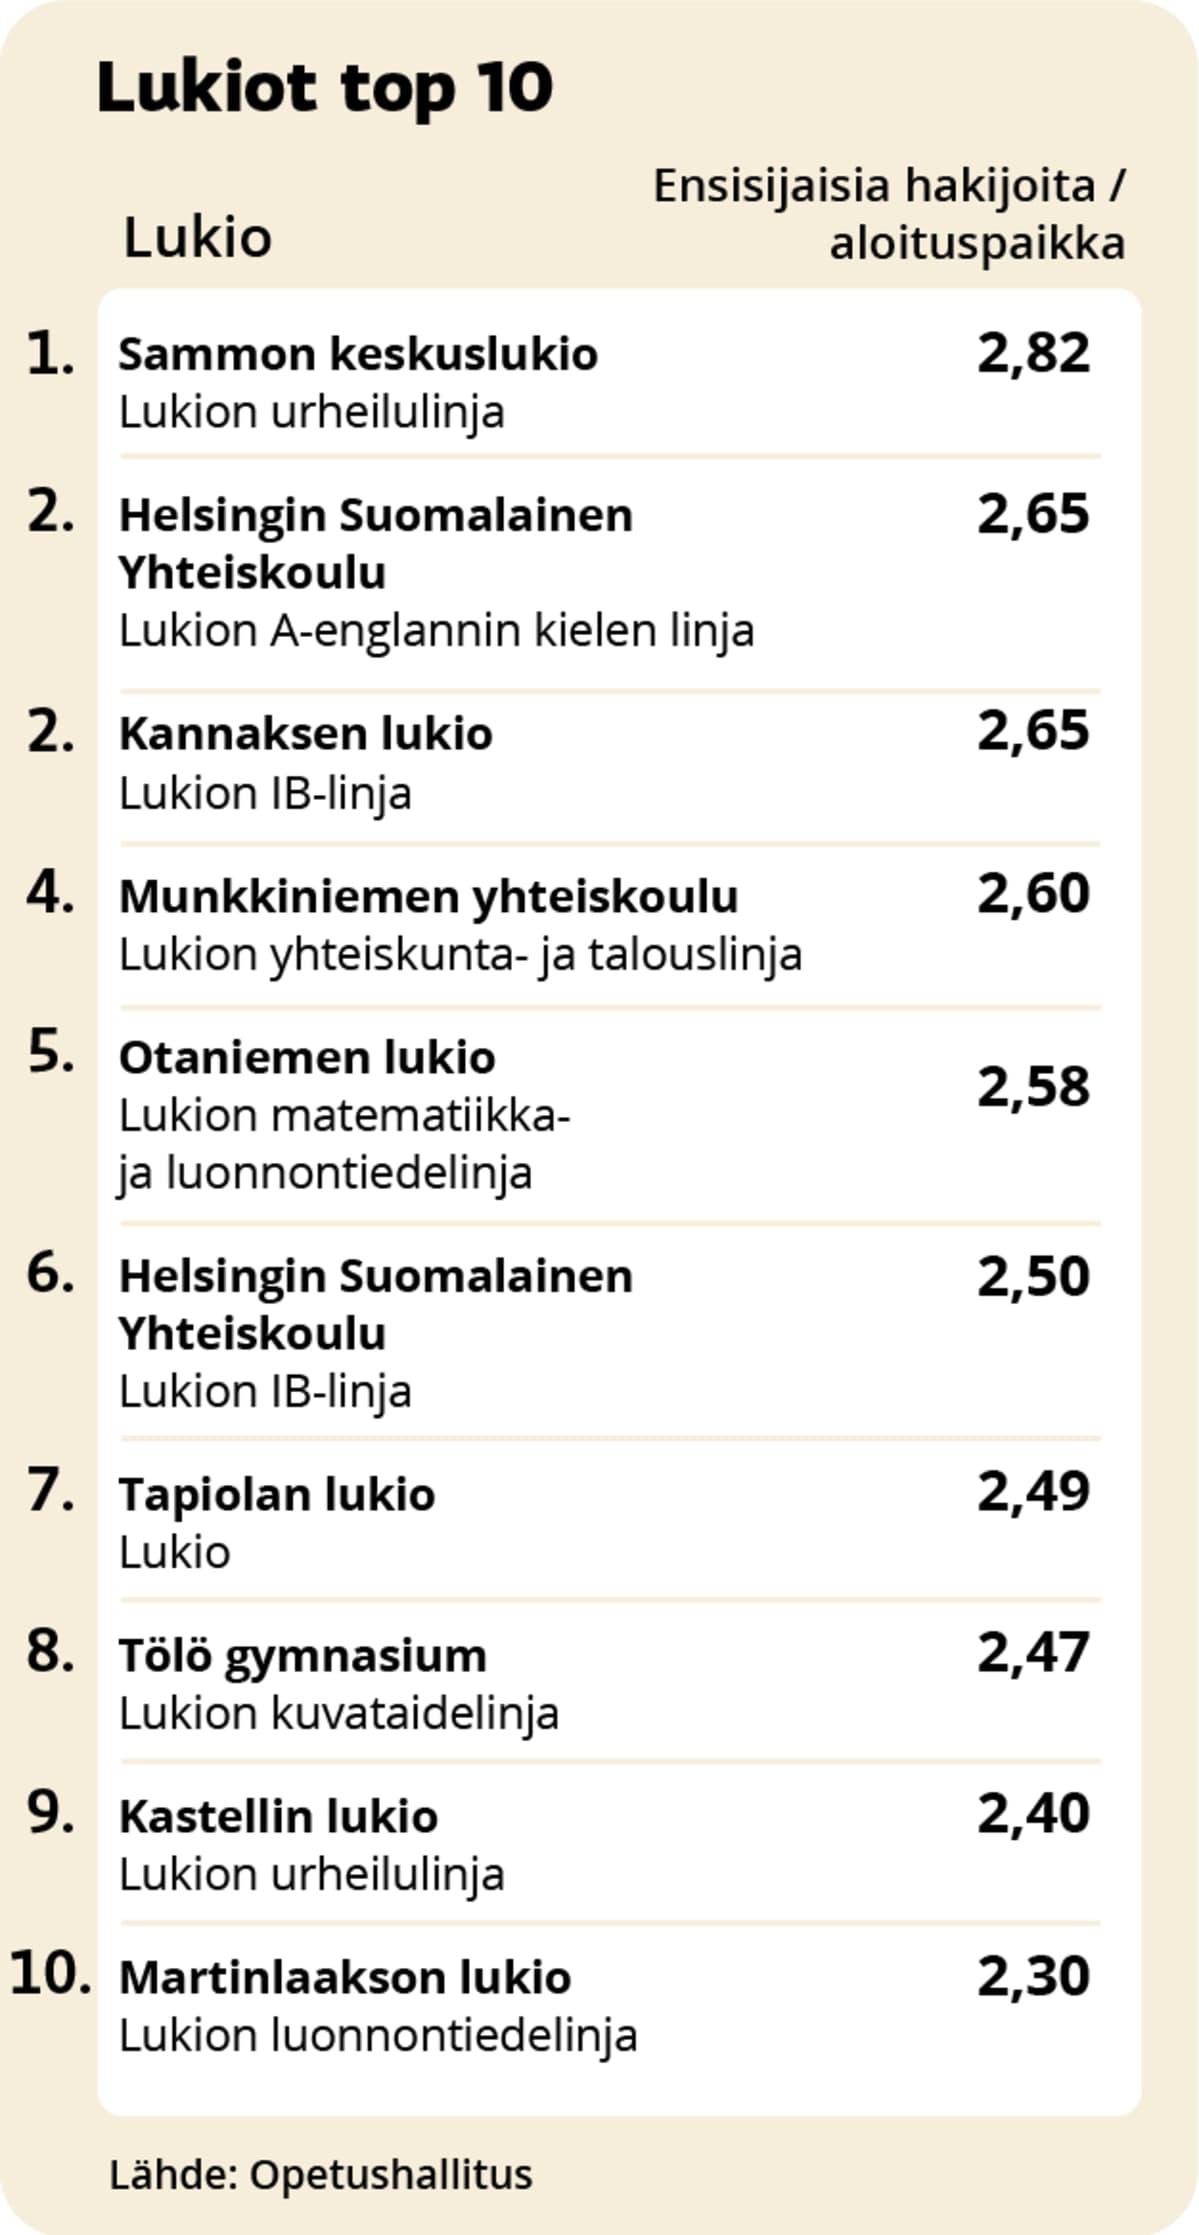 Kilpailuimmat lukiot 2021 top-10